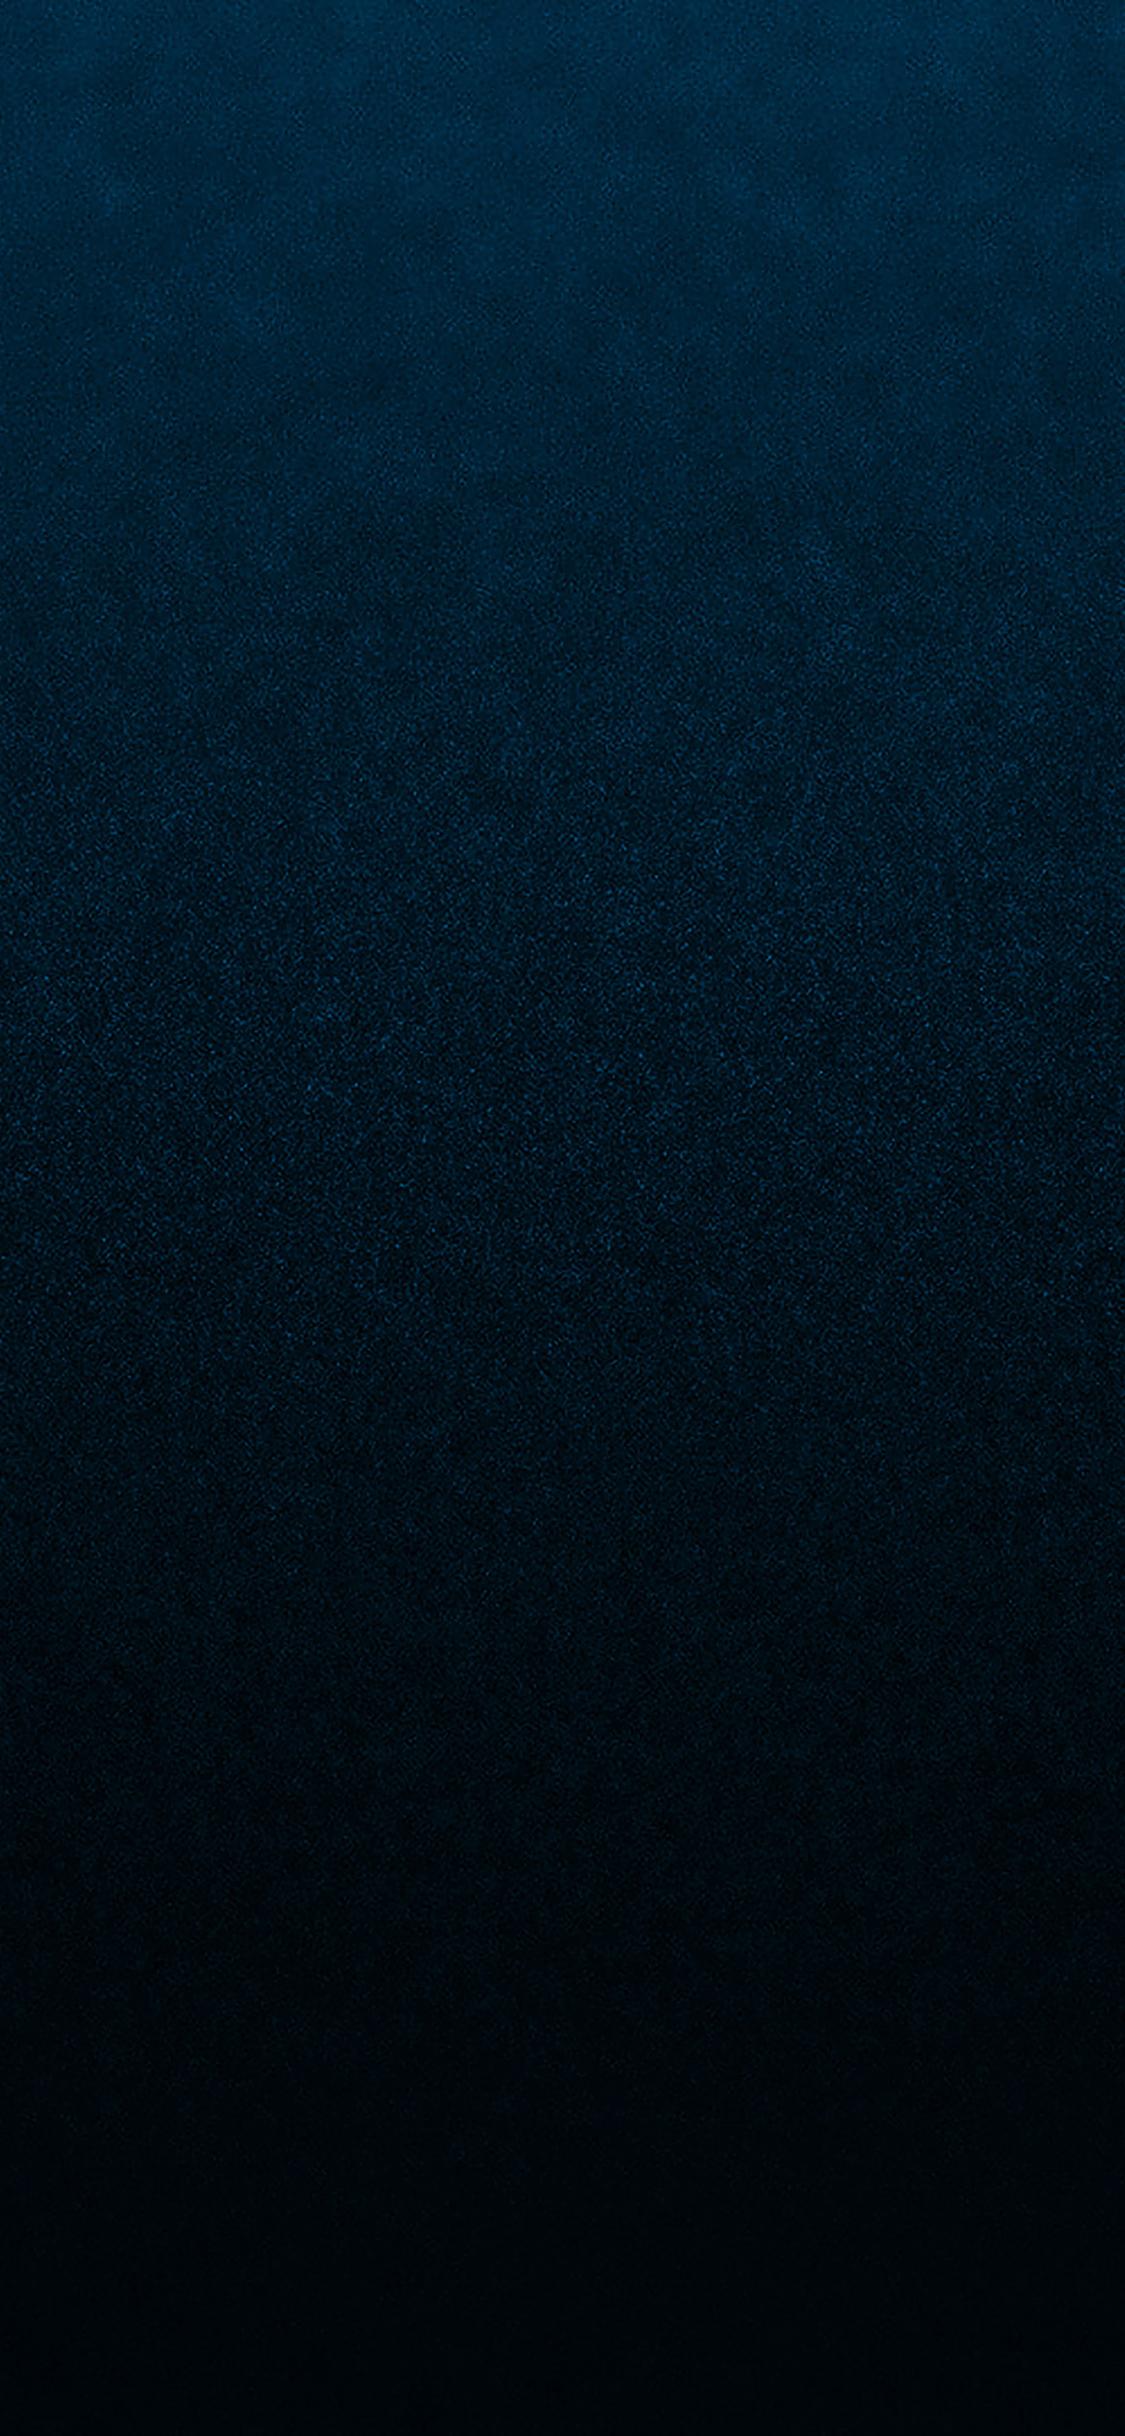 iPhoneXpapers.com-Apple-iPhone-wallpaper-vb26-wallpaper-blue-tuesday-pattern